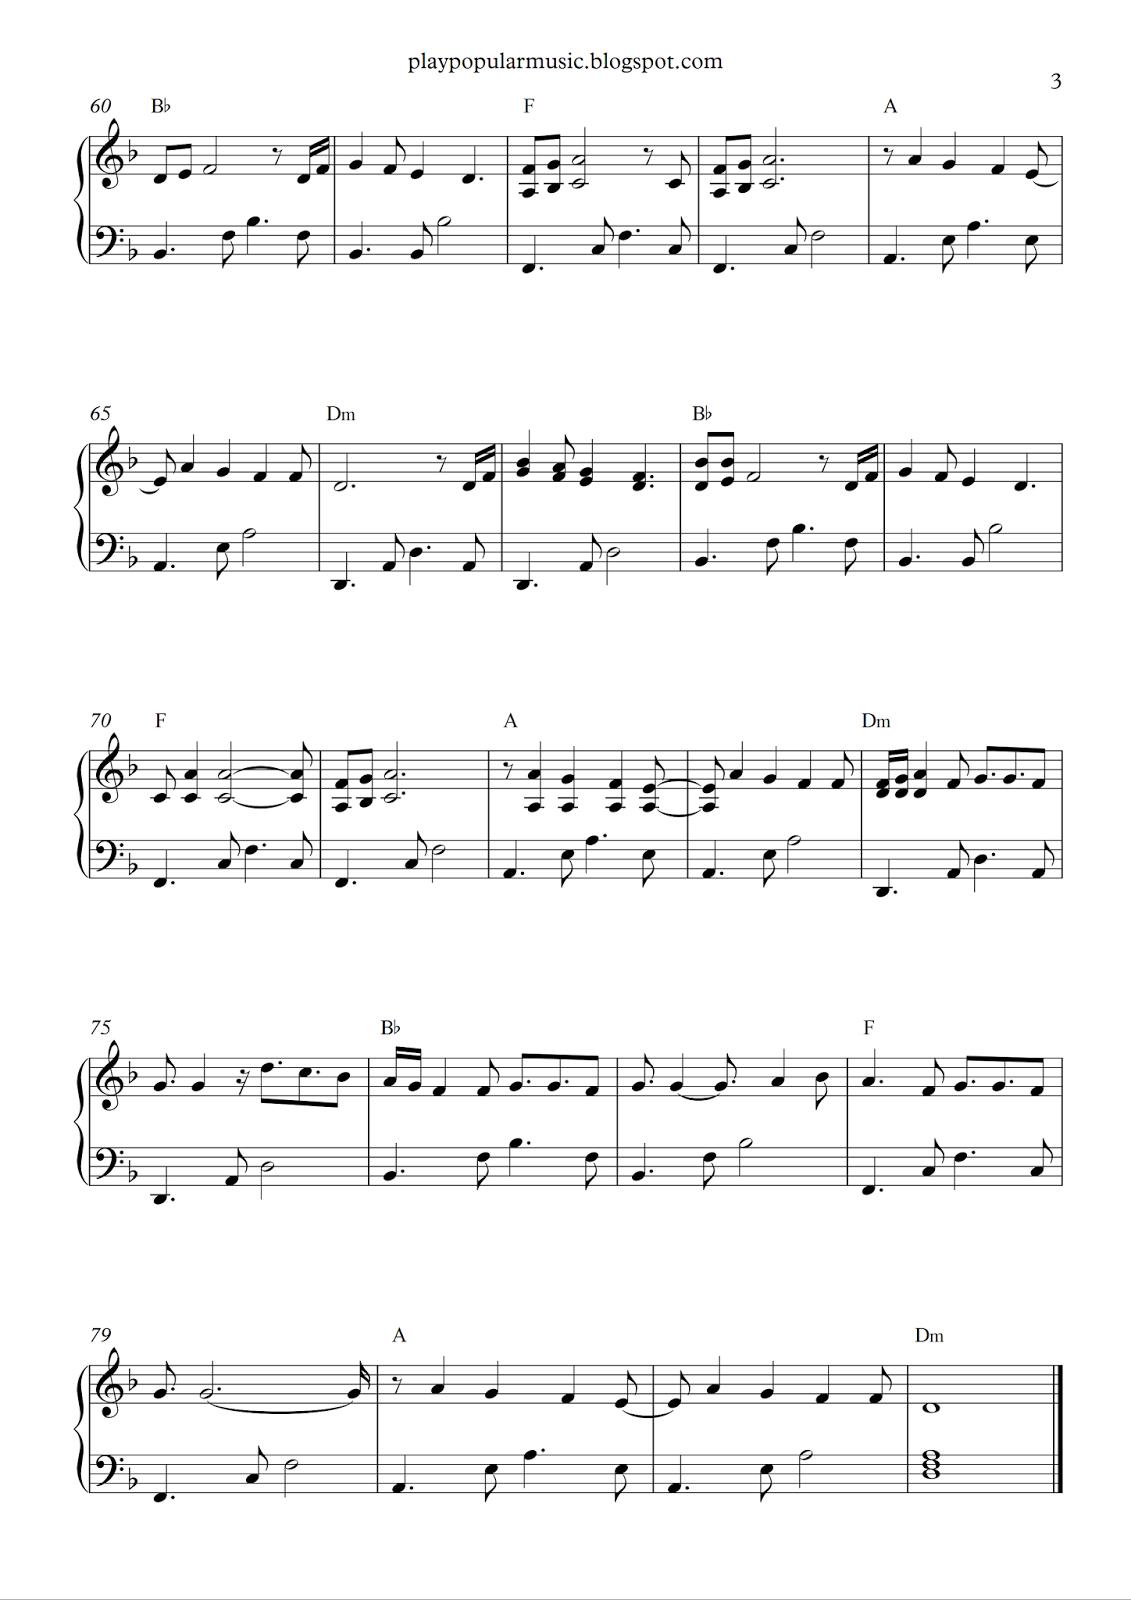 Free piano sheet music rise katy perrypdf victory is in my free piano sheet music rise katy perrypdf victory is in my veins hexwebz Choice Image